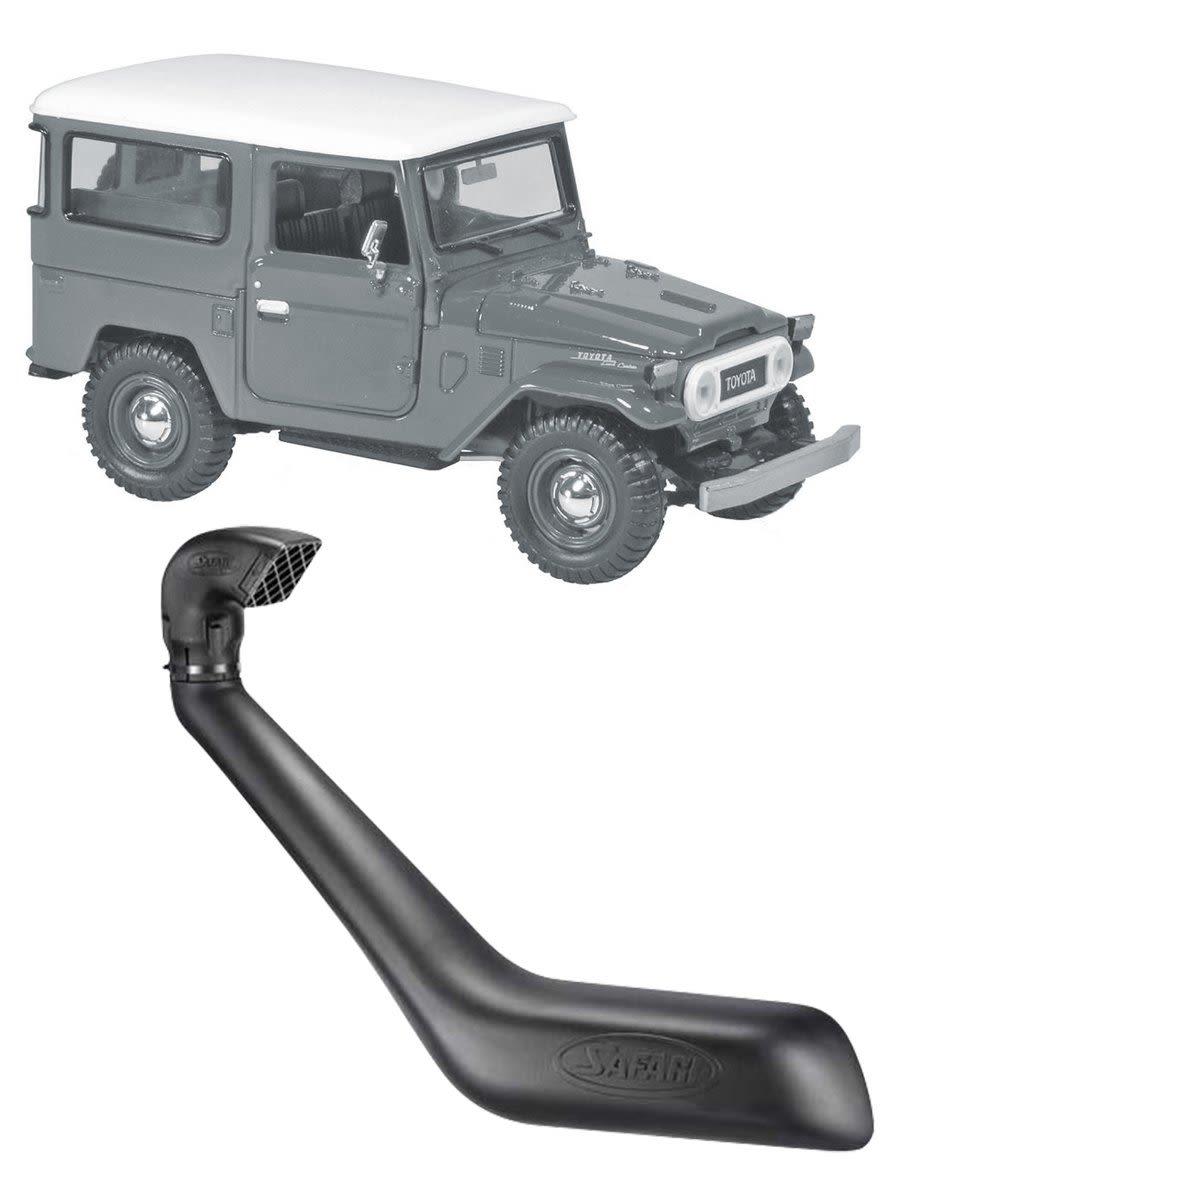 Safari Snorkel to suit Toyota Landcruiser (11/1972 - 01/1985)